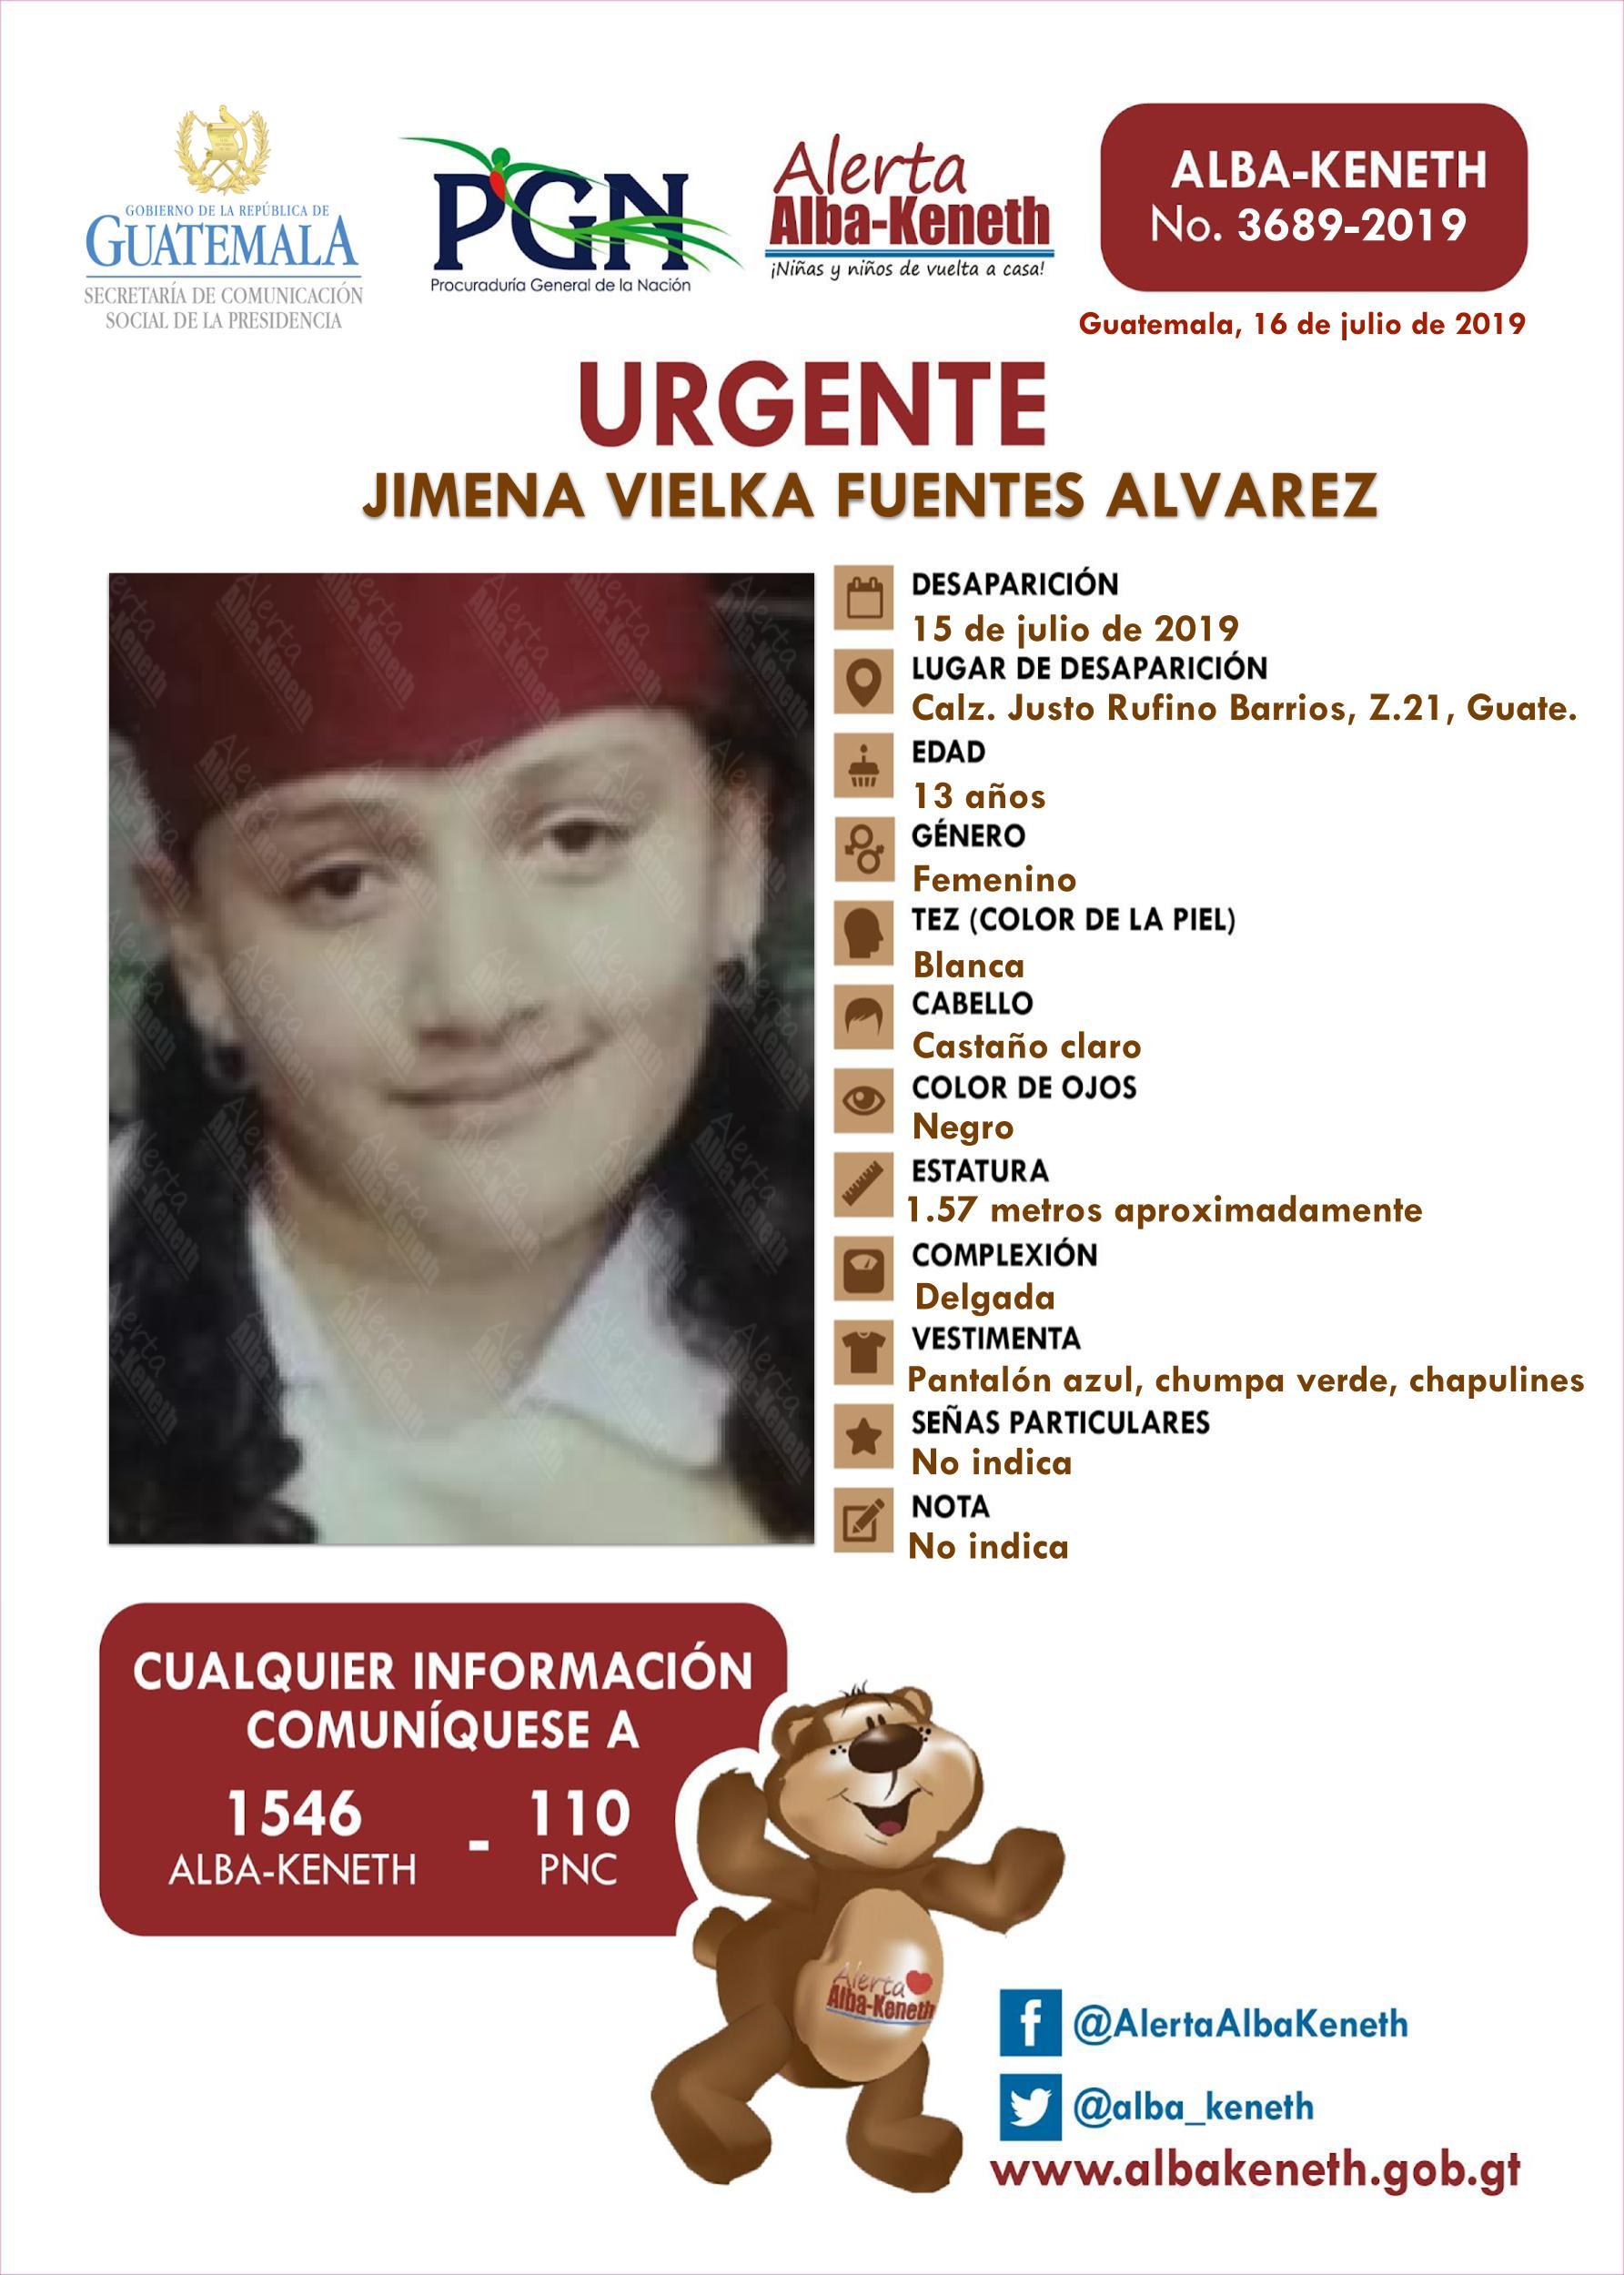 Jimena Vielka Fuentes Alvarez